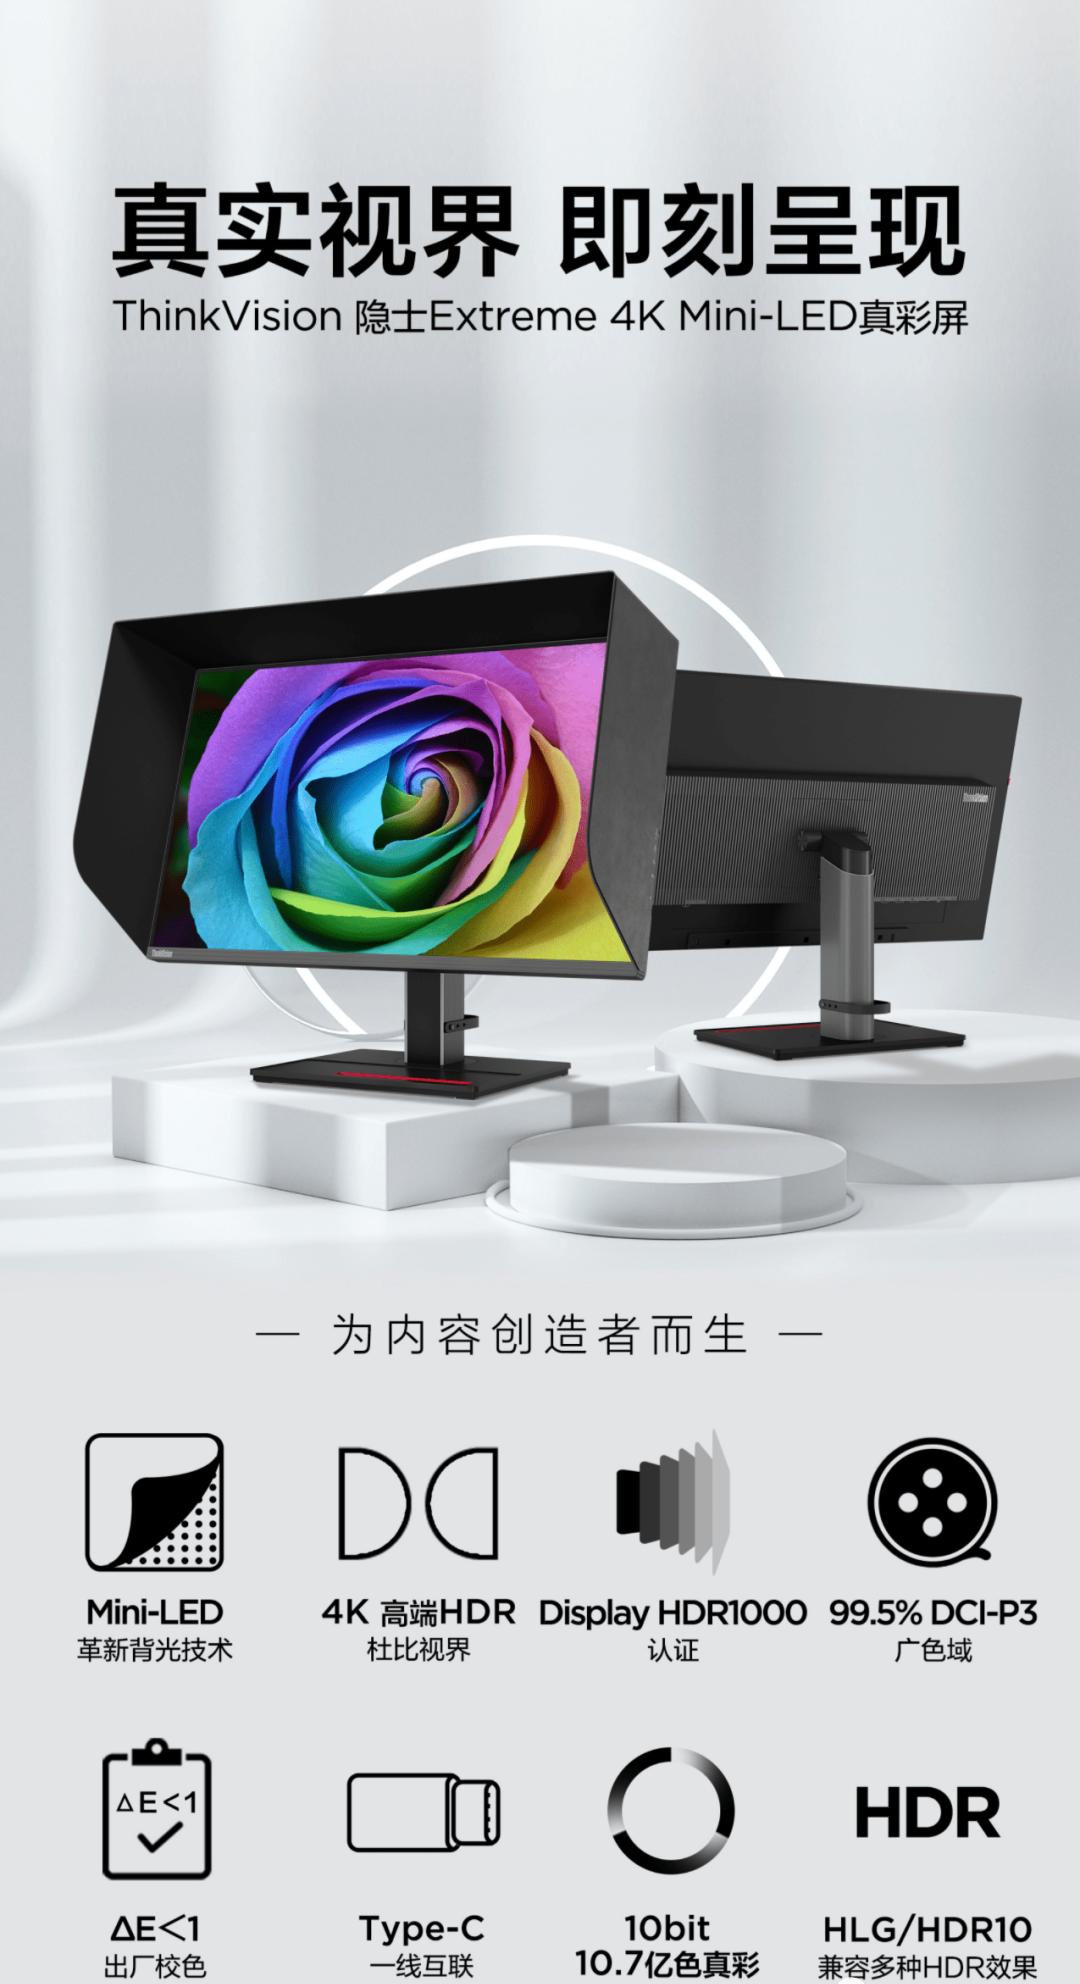 Mini LED | 15999元!联想Mini LED显示器来了  第2张